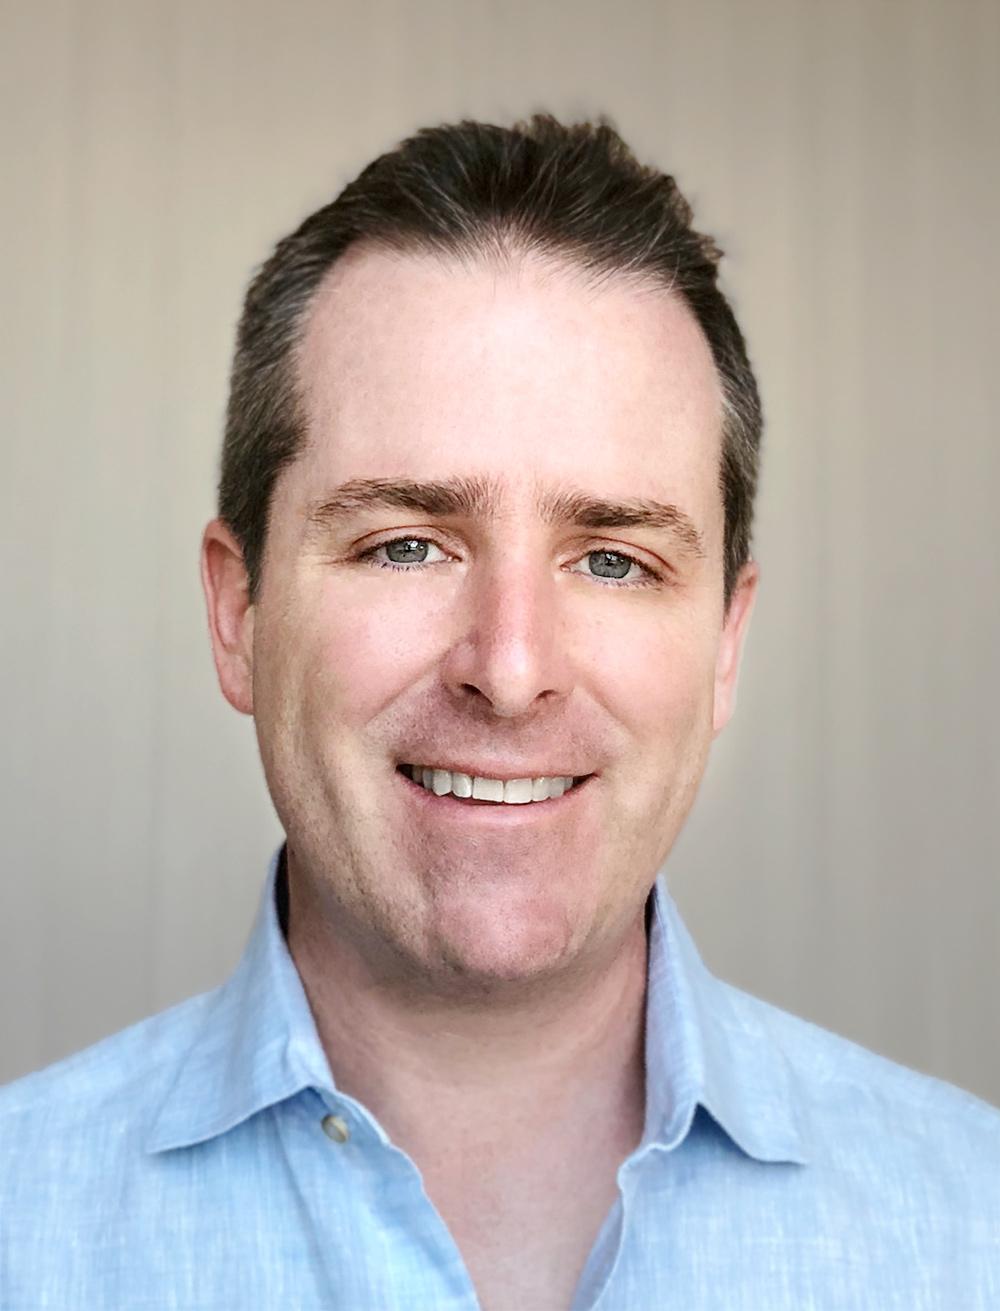 Matthew Tenzin Headshot Finall 1000px.jpg